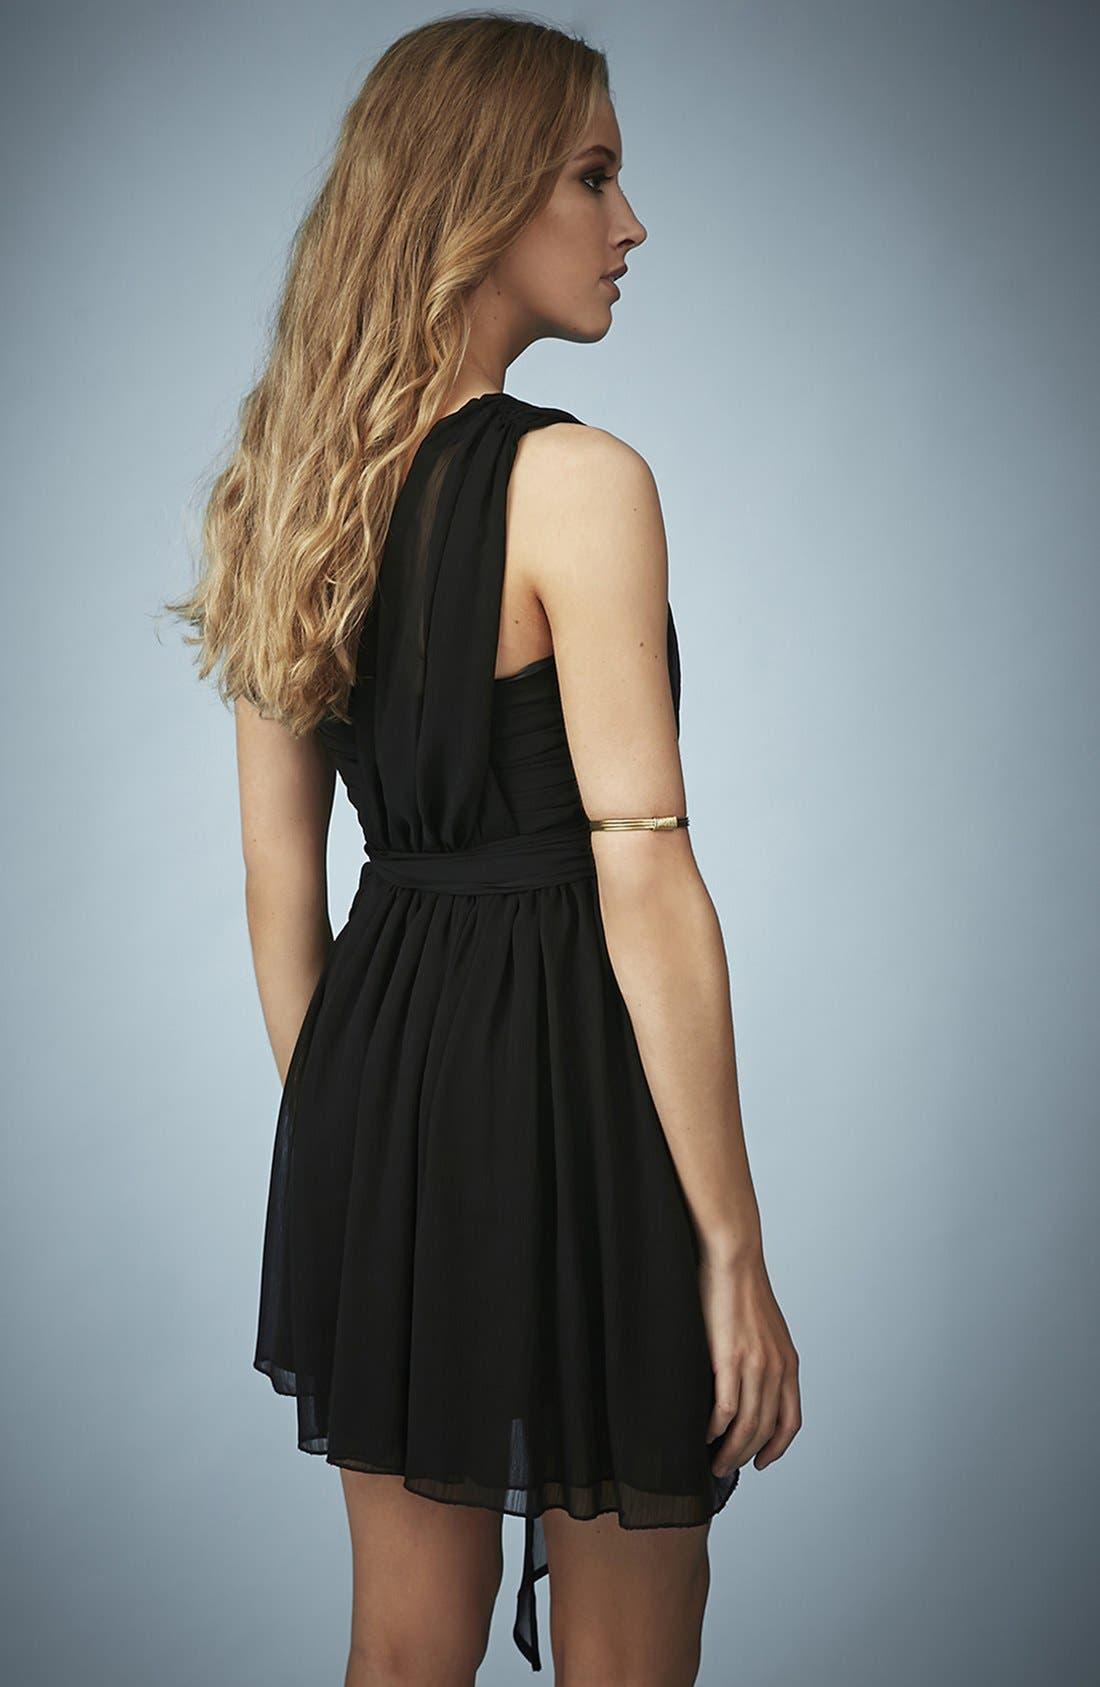 TOPSHOP, Kate Moss for Topshop One-Shoulder Chiffon Dress, Alternate thumbnail 3, color, 001